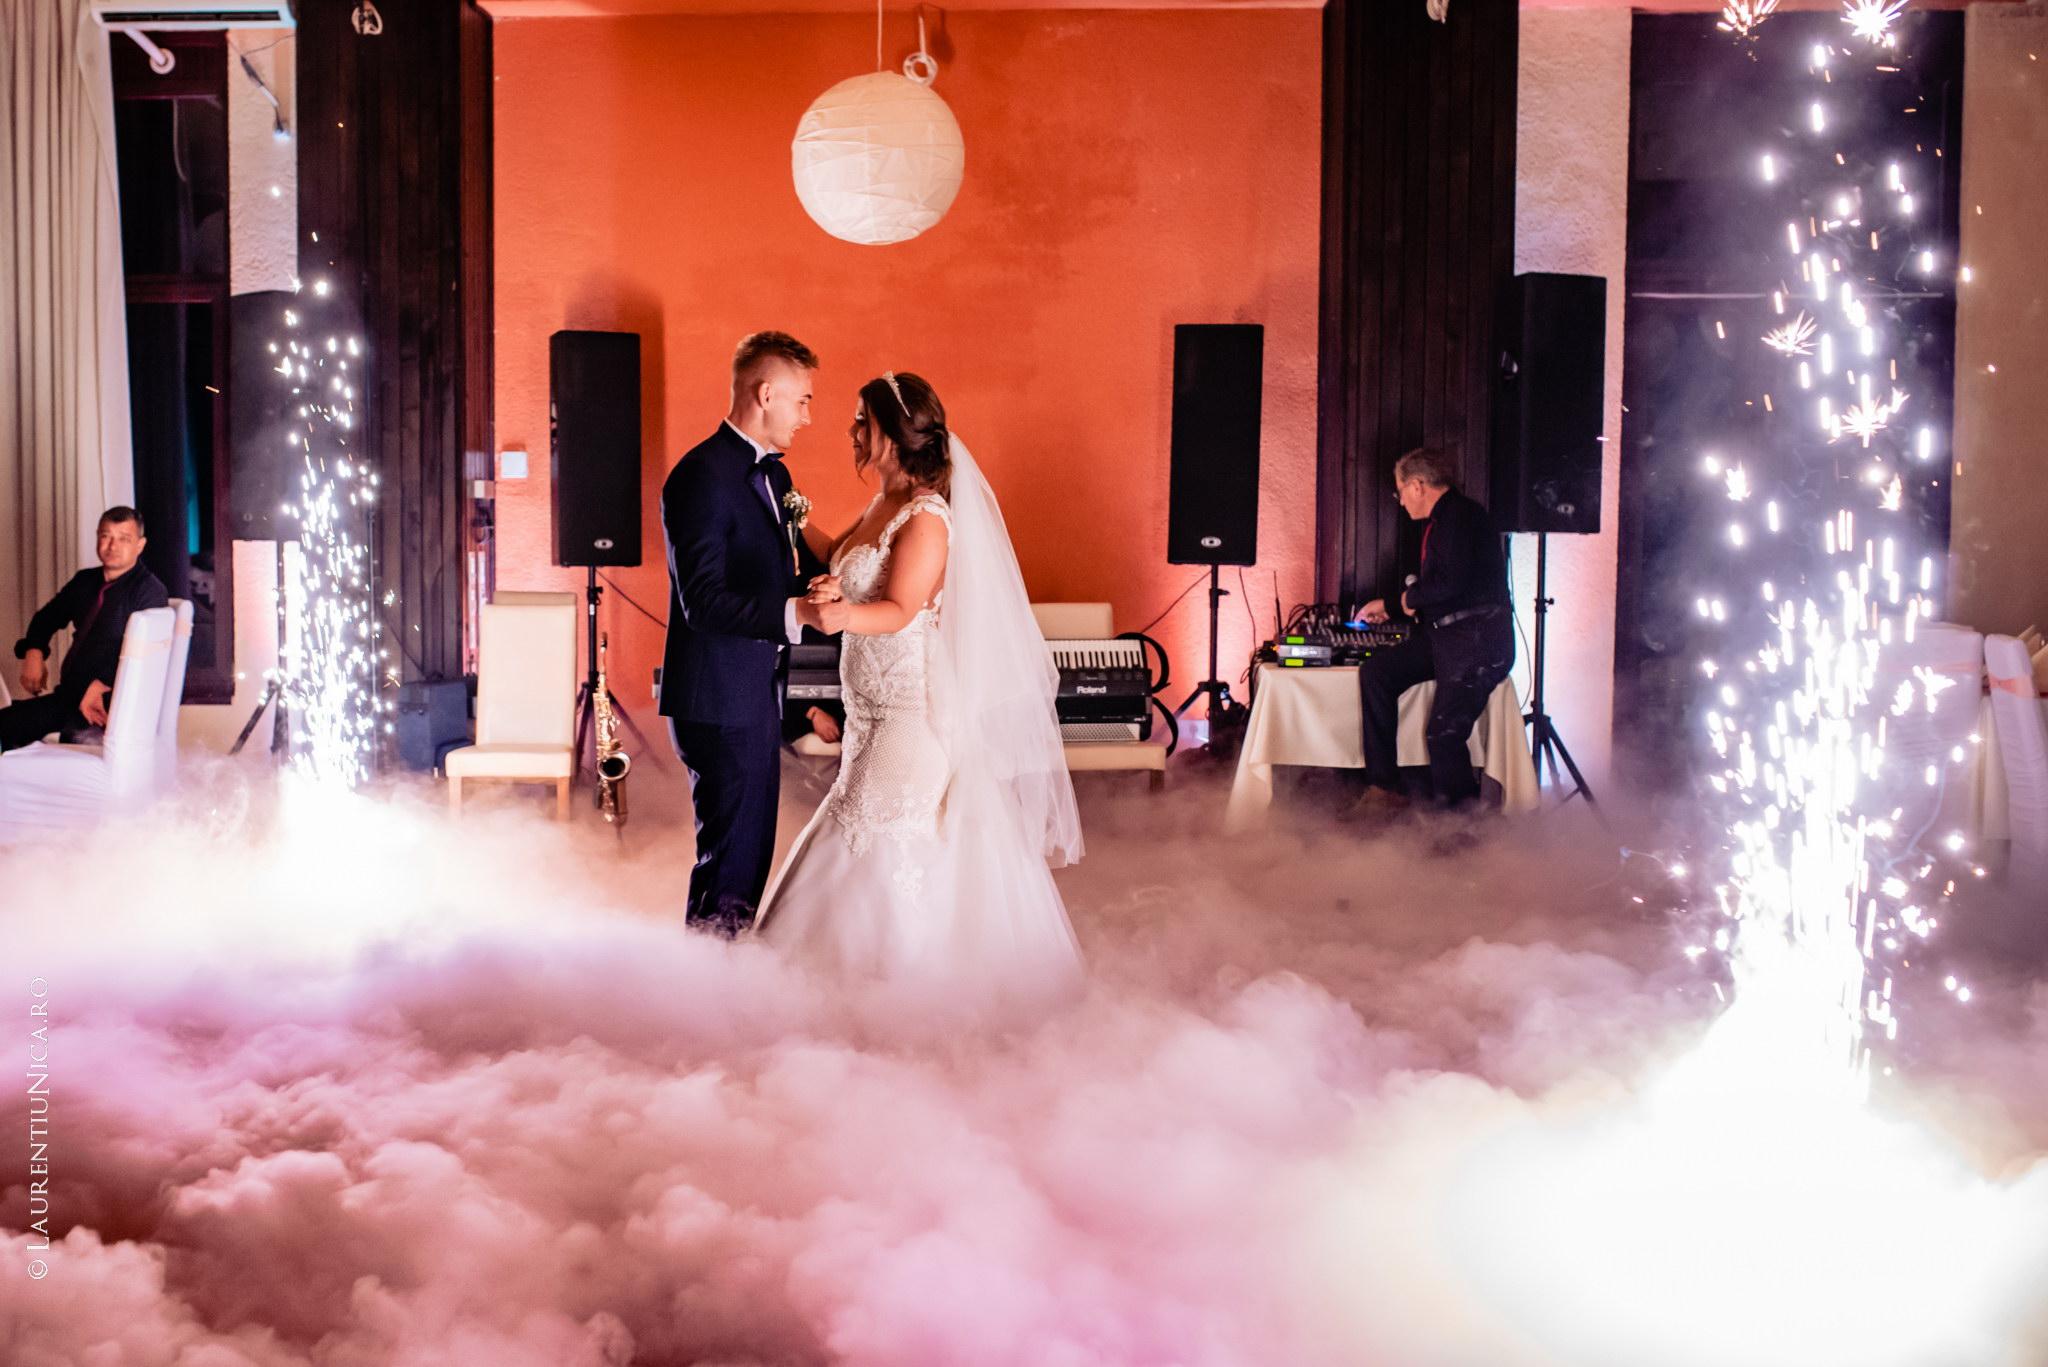 fotografii nunta Roxana si Cosmin fotograf nunta laurentiu nica 37 - Roxana & Cosmin | Fotografii nunta | Ticleni, judetul Gorj